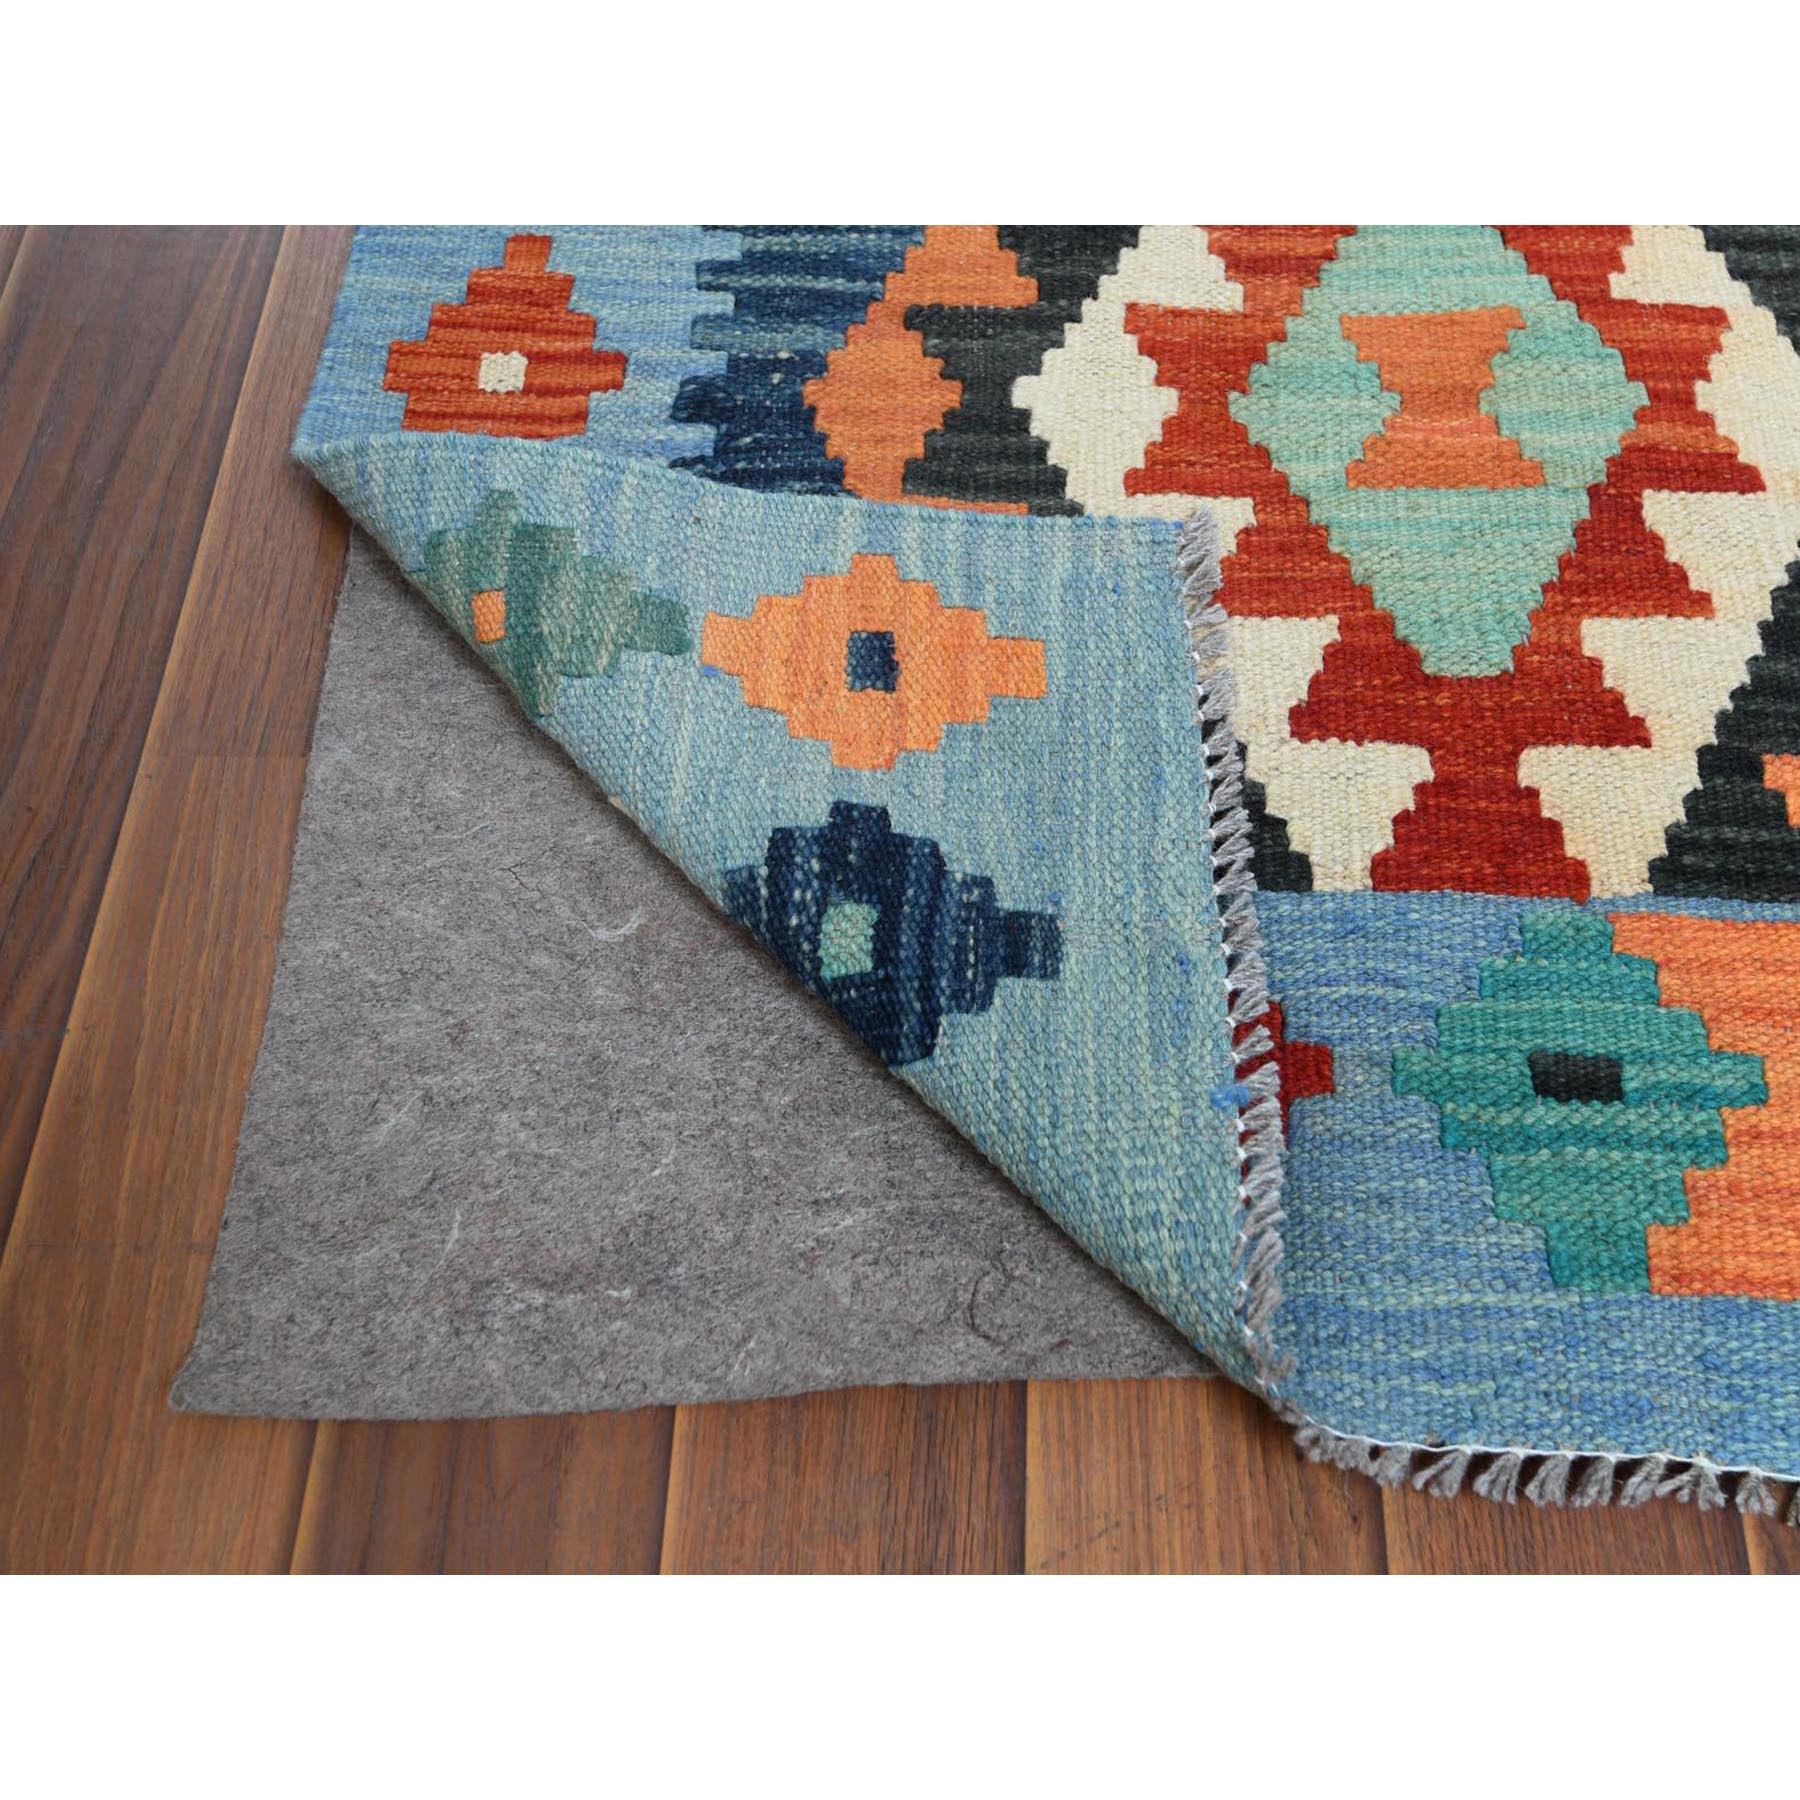 "2'6""x9'7"" Colorful Geometric Design Afghan Kilim Reversible Velvety Wool Hand Woven Oriental Runner Rug"